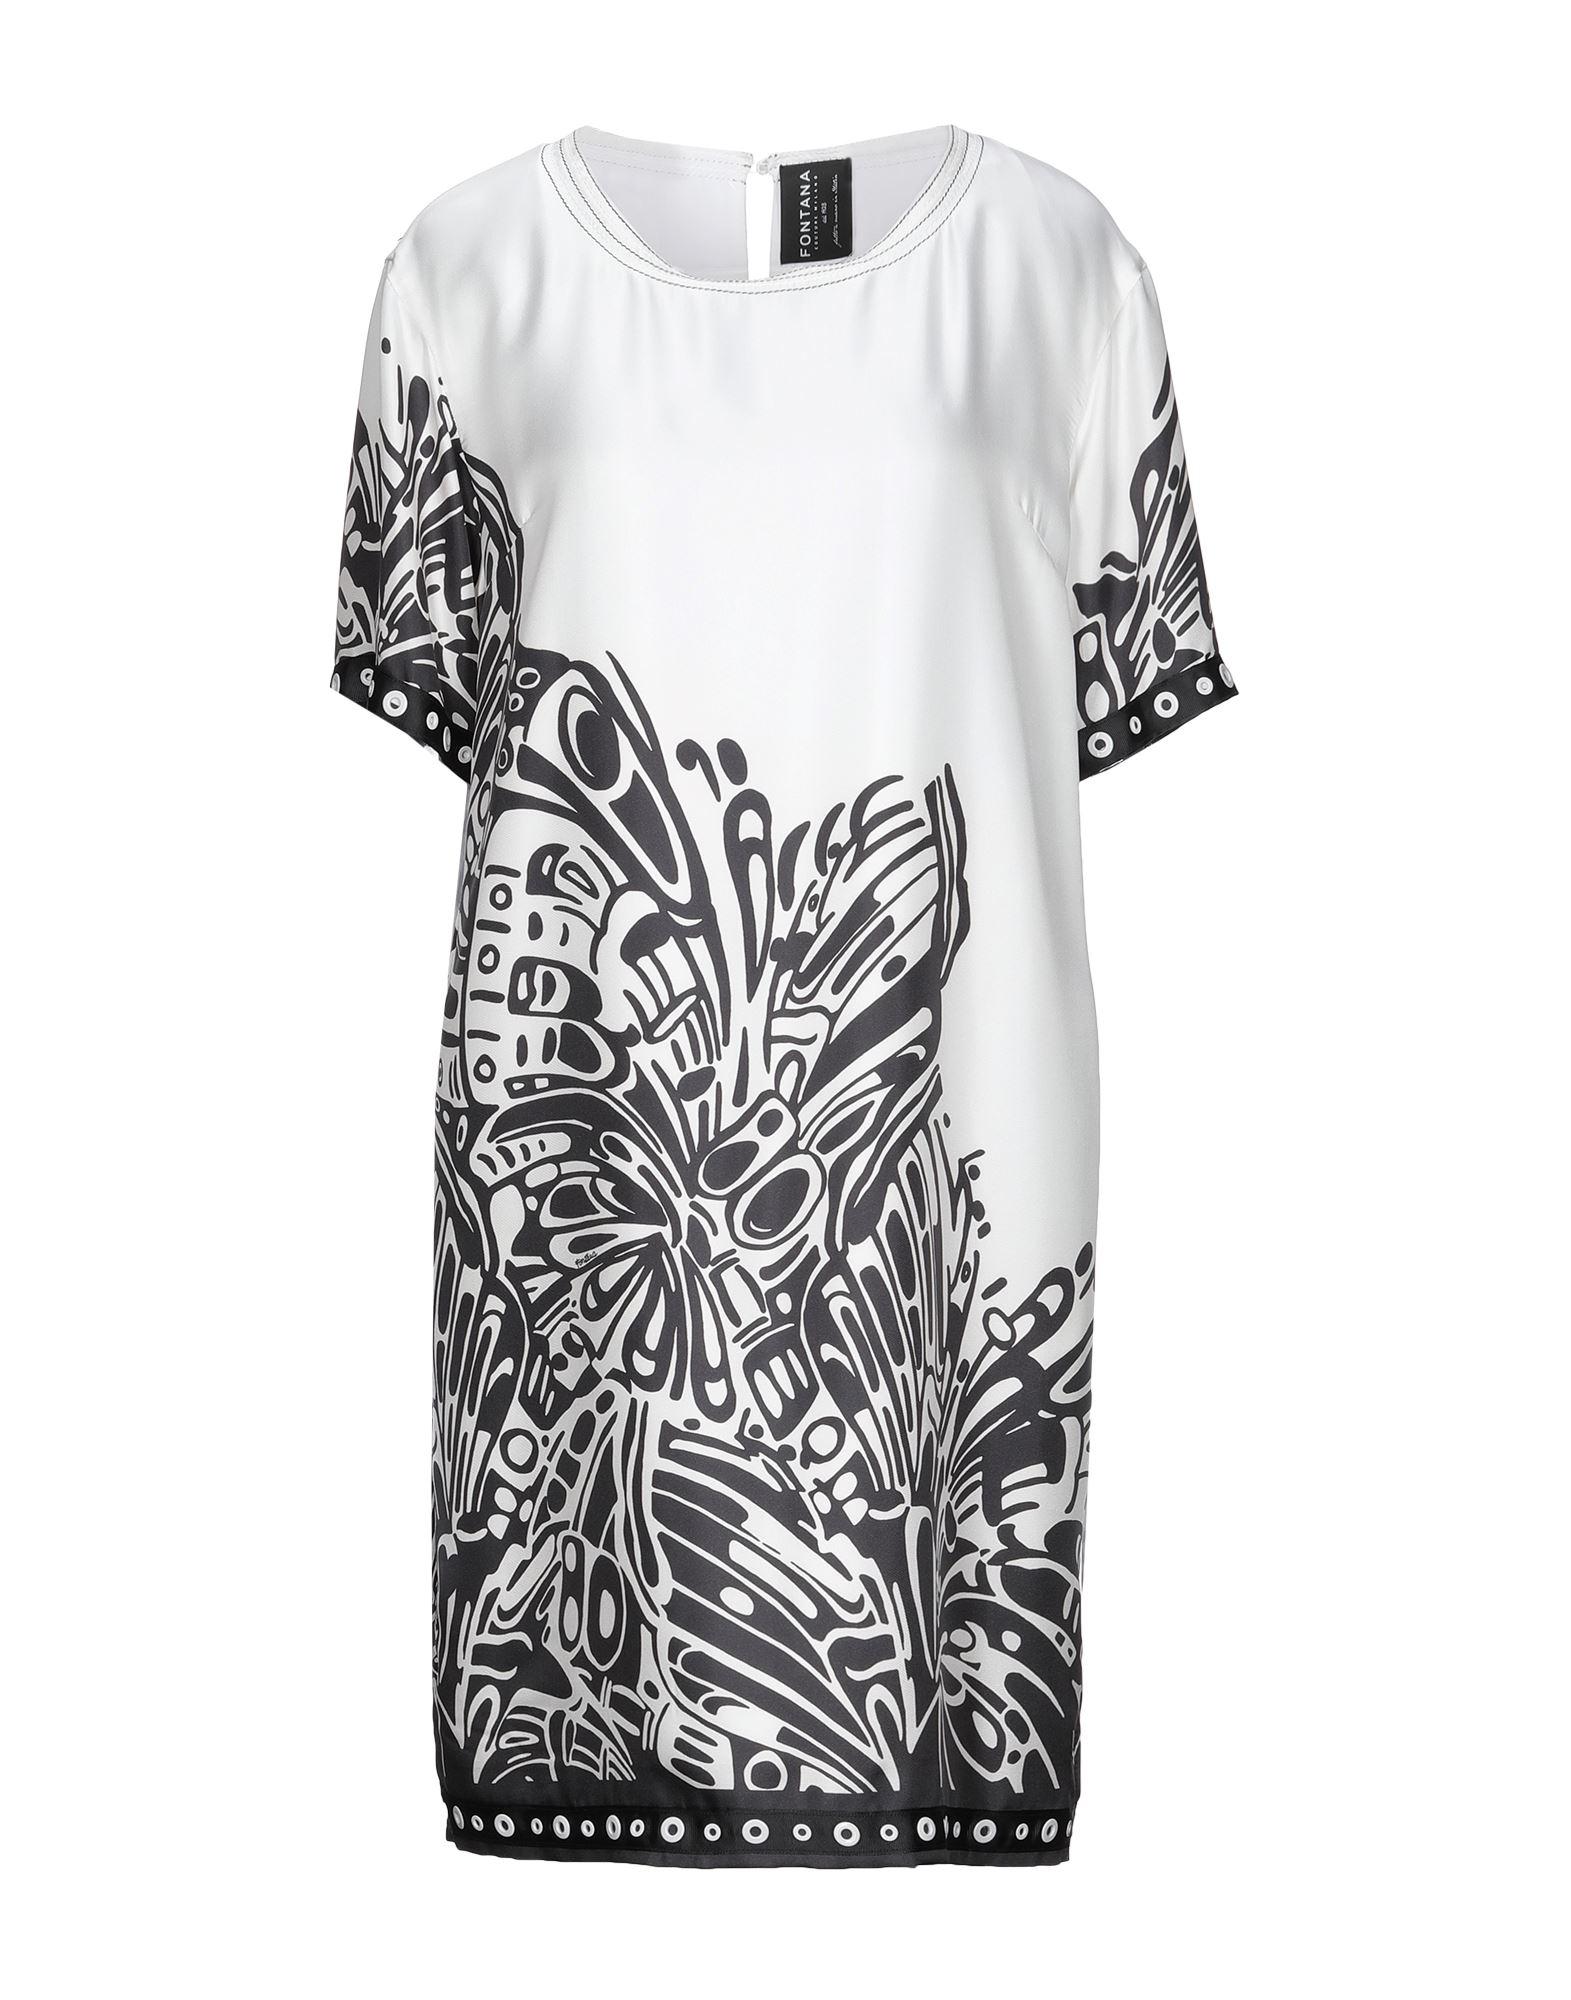 Фото - FONTANA COUTURE Короткое платье fontana couture кардиган